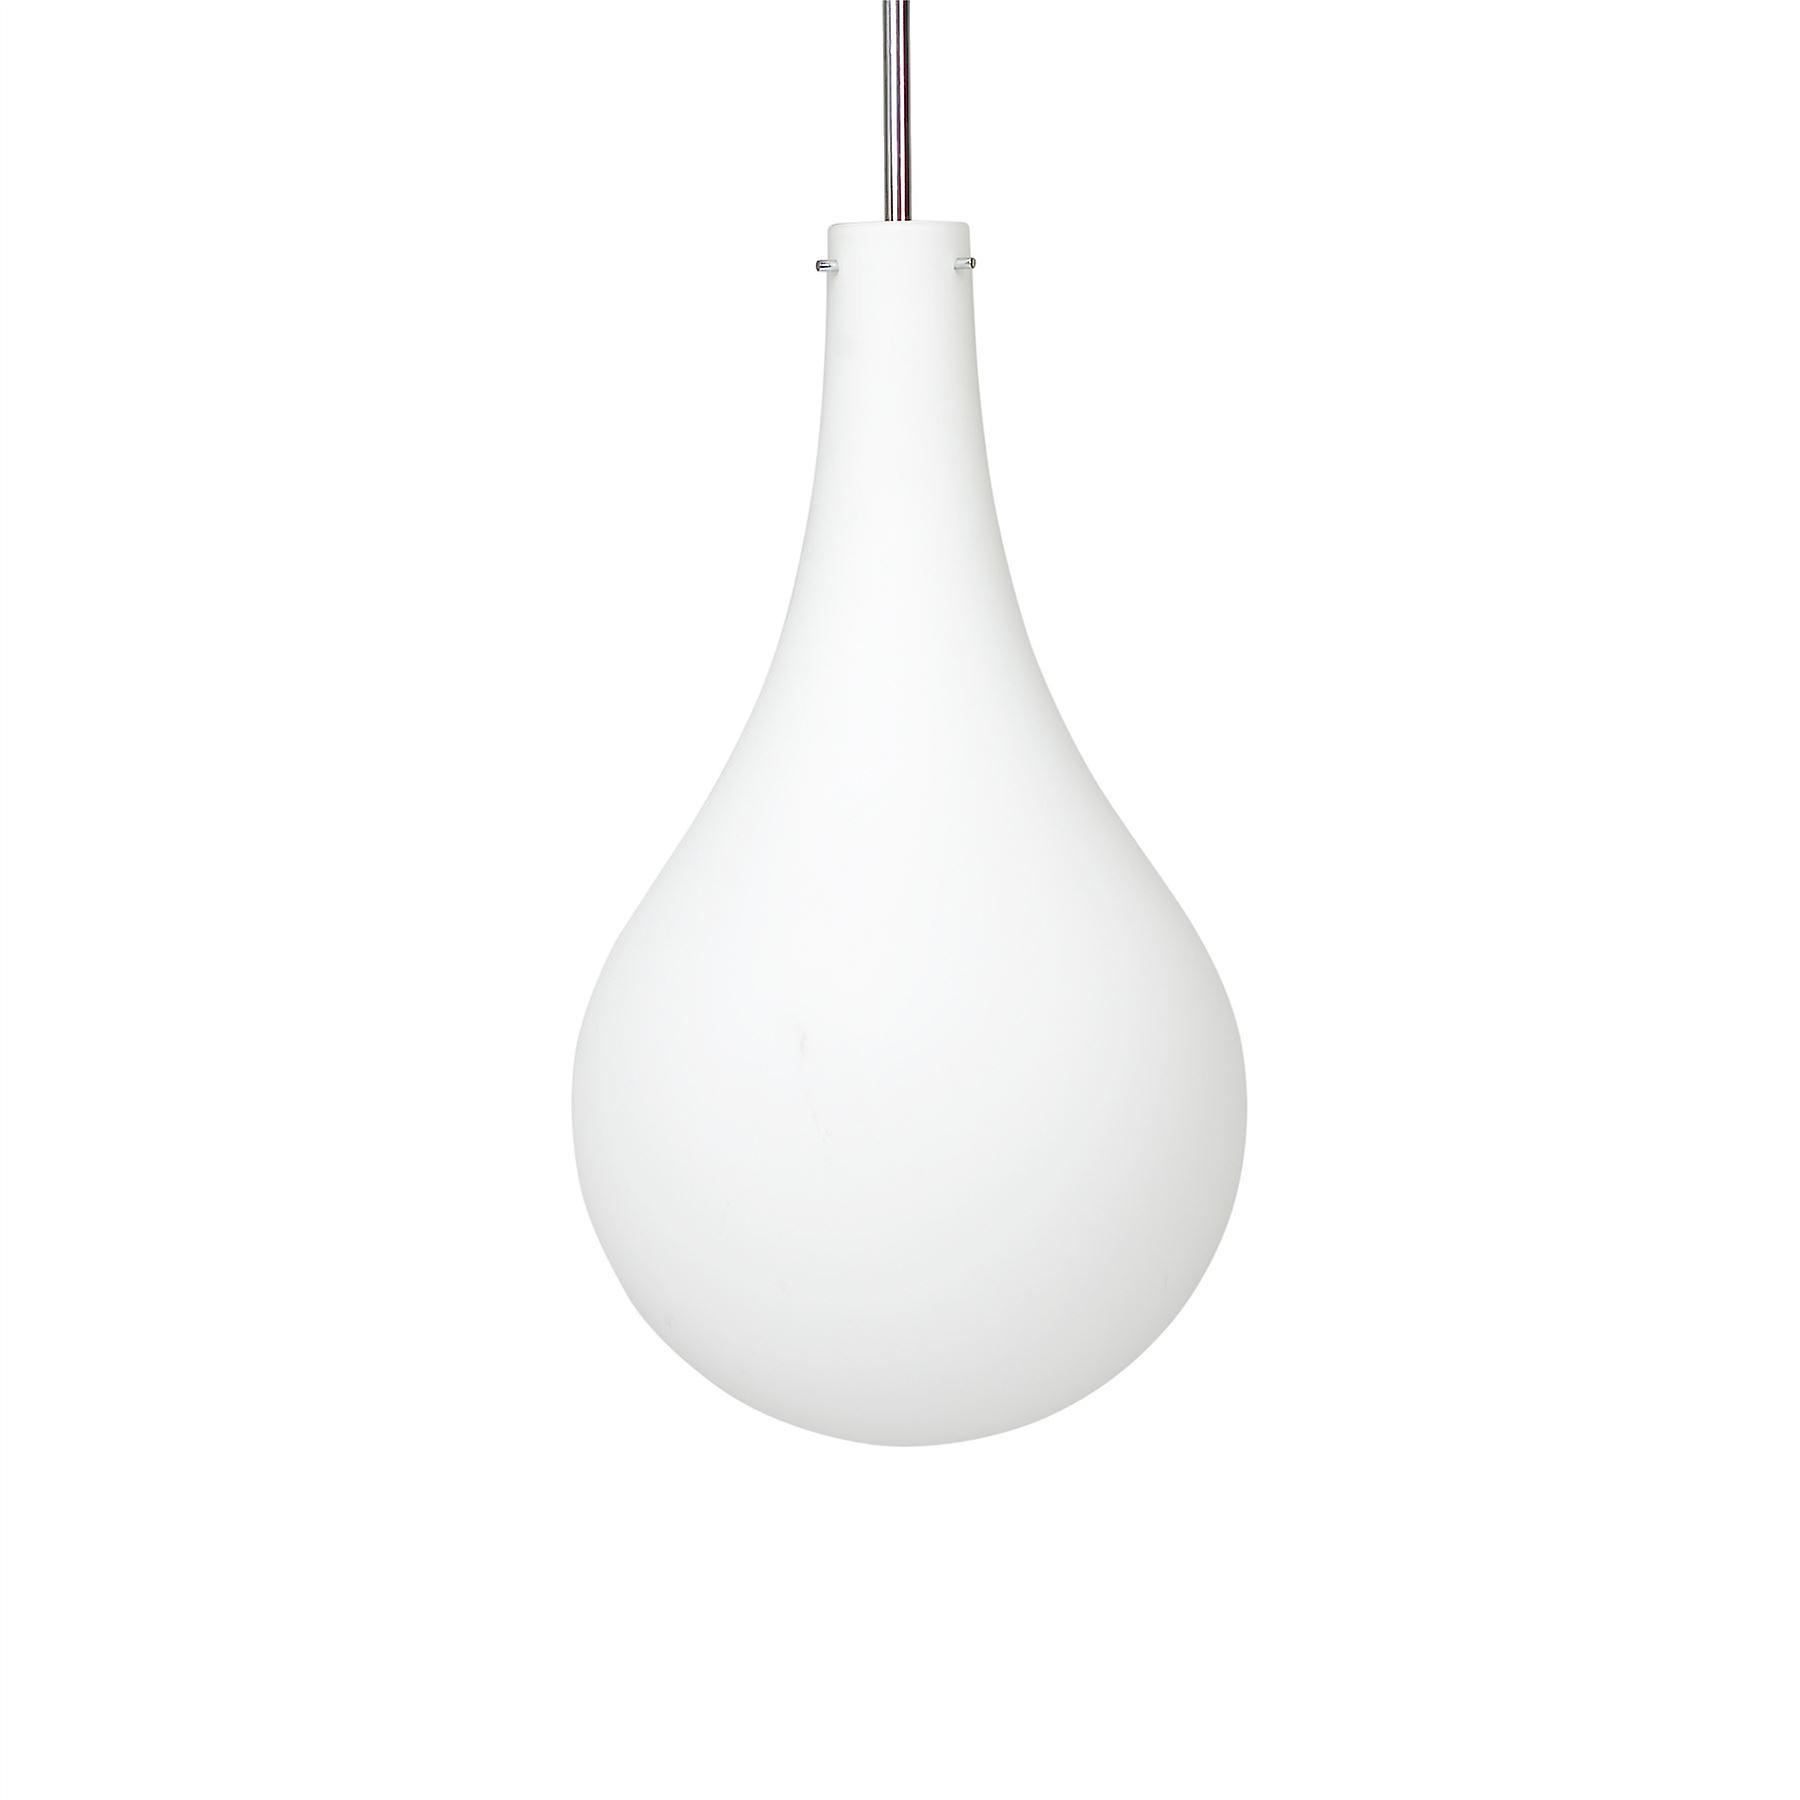 Belid - Cooper LED Pendant Light Opal Finish 1457389